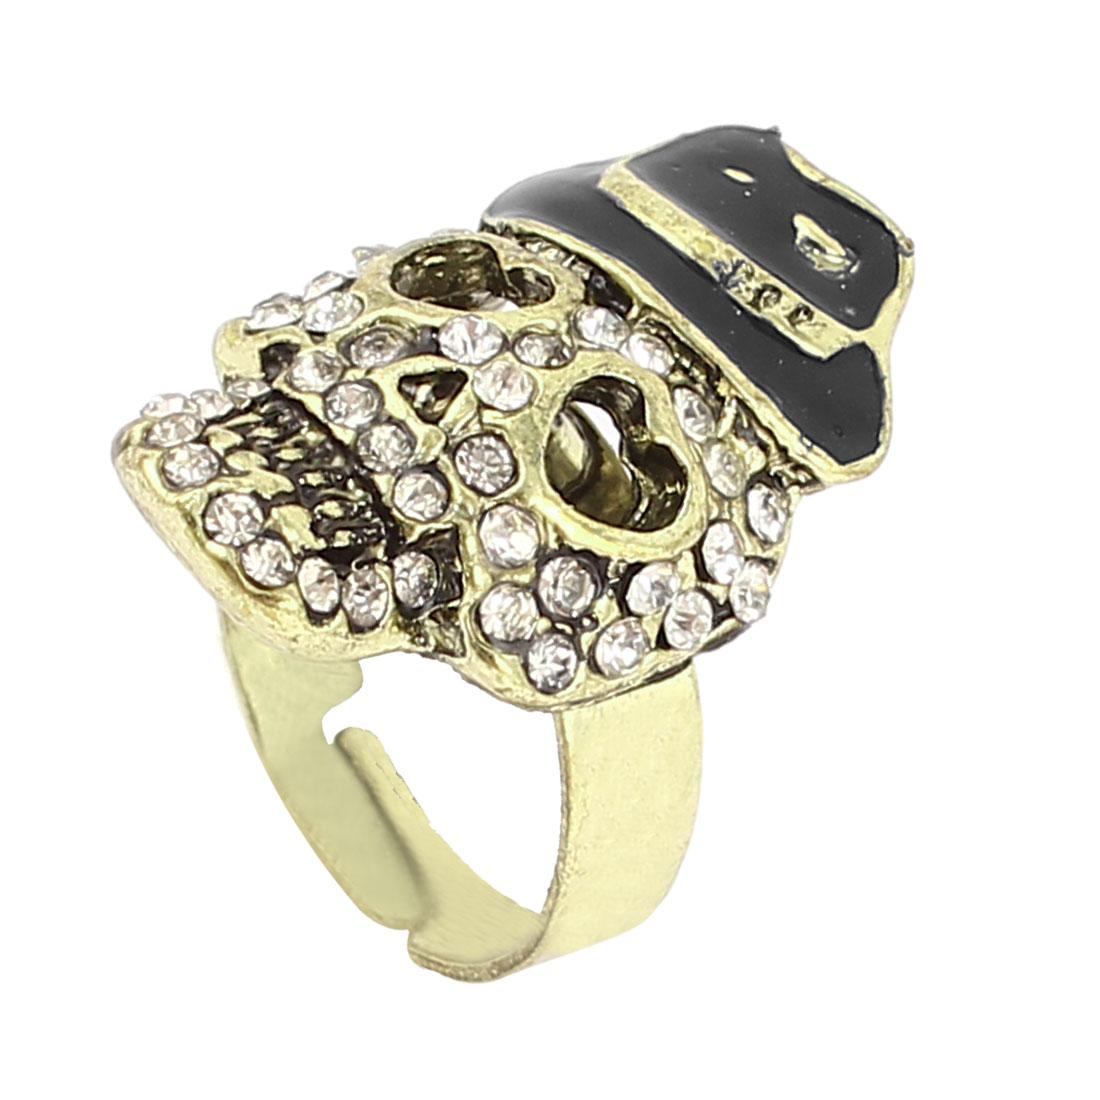 US 6 1/4 Bronze Tone Metal Skeleton Shape Rhinestone Detailing Finger Ring for Lady